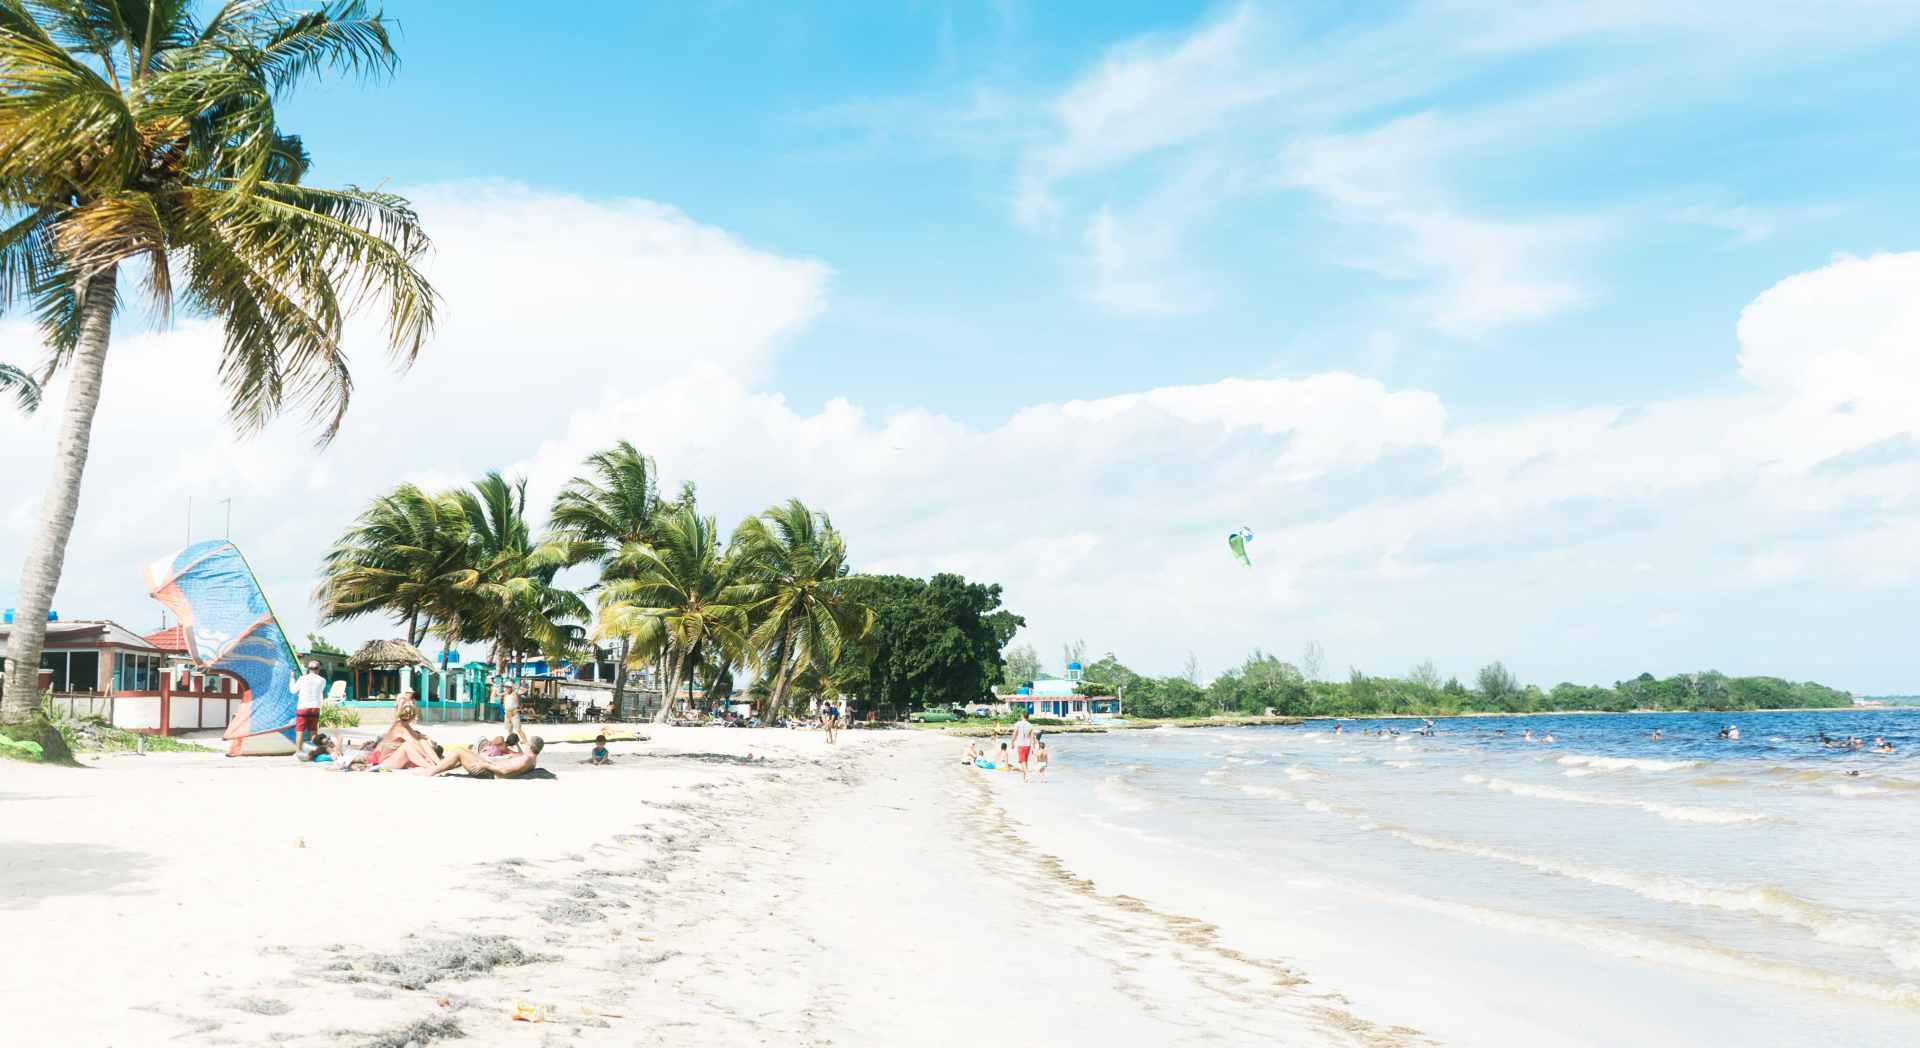 Playa Larga Cover